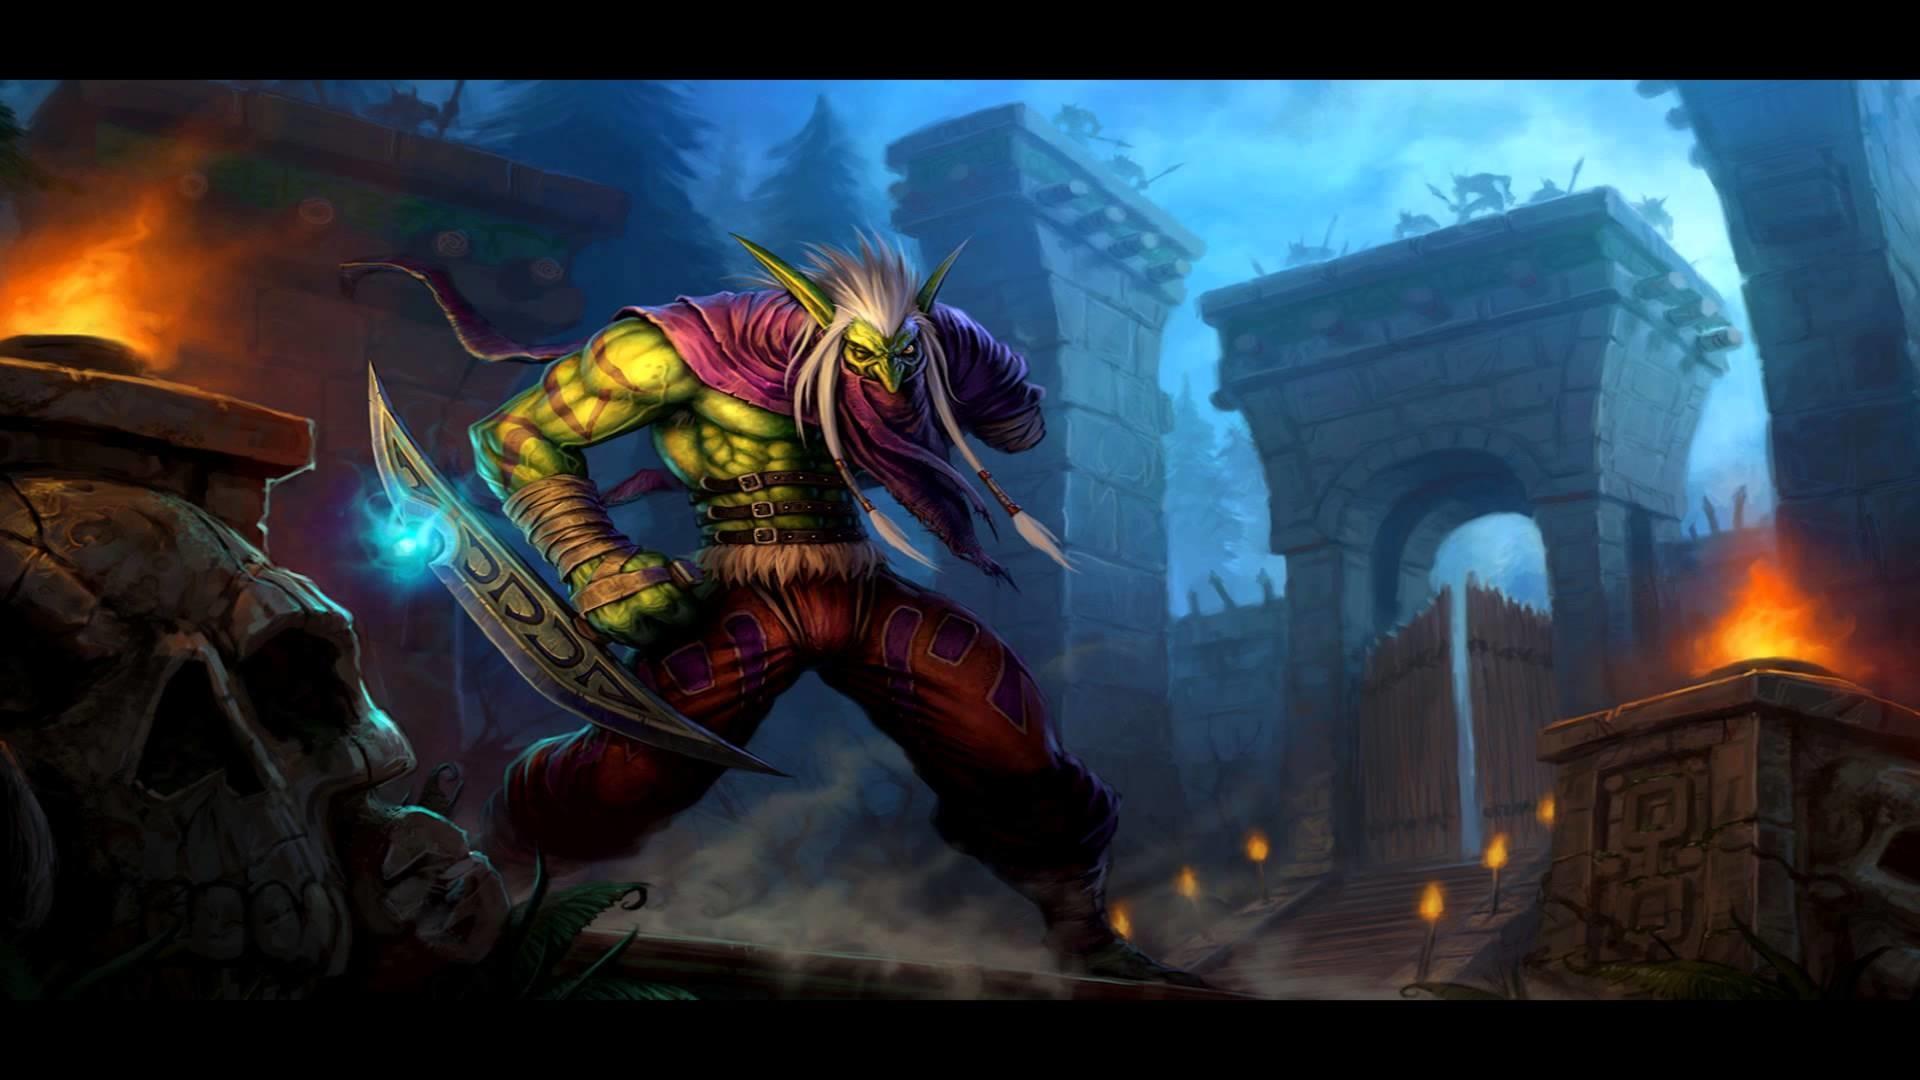 World Of Warcraft Wallpapers Hd Troll Wow Wallpaper 183 ① Wallpapertag